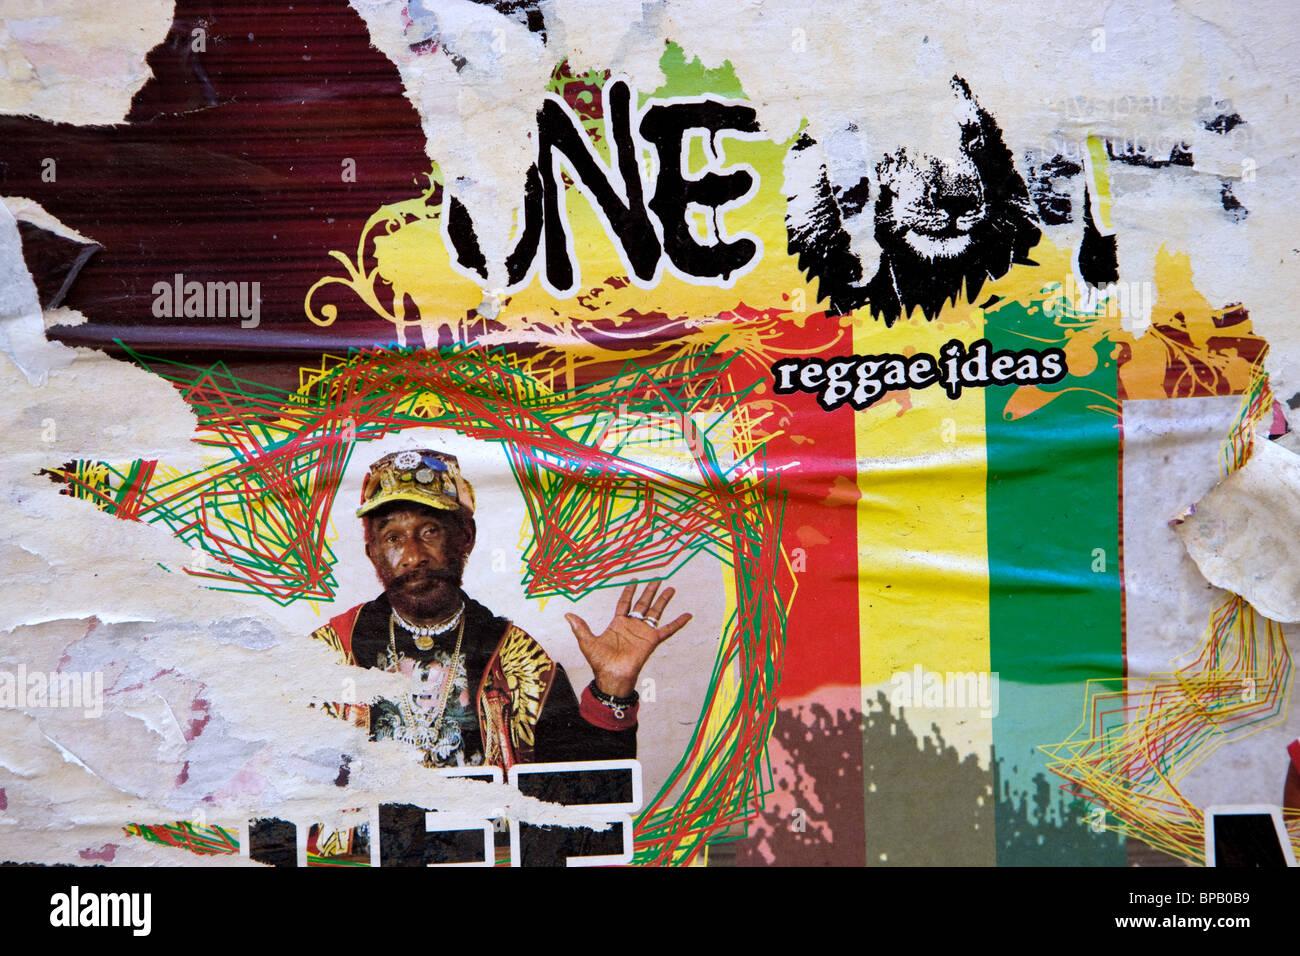 drawings on wall, mural, reggae, - Stock Image